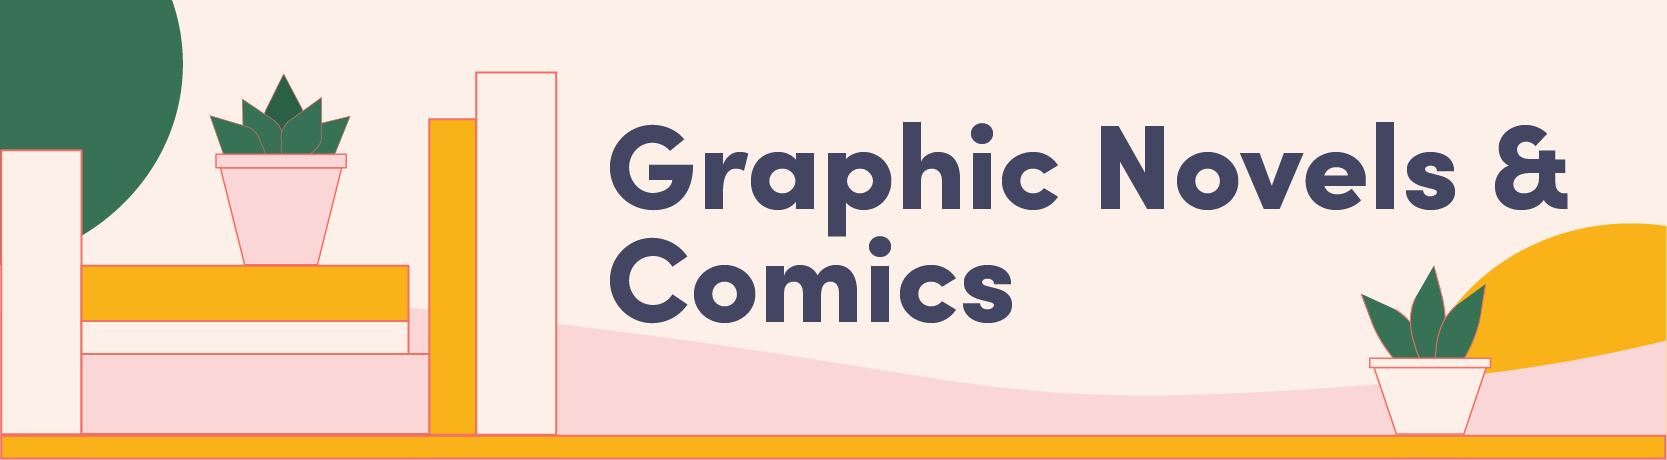 Graphic Novels & Comics